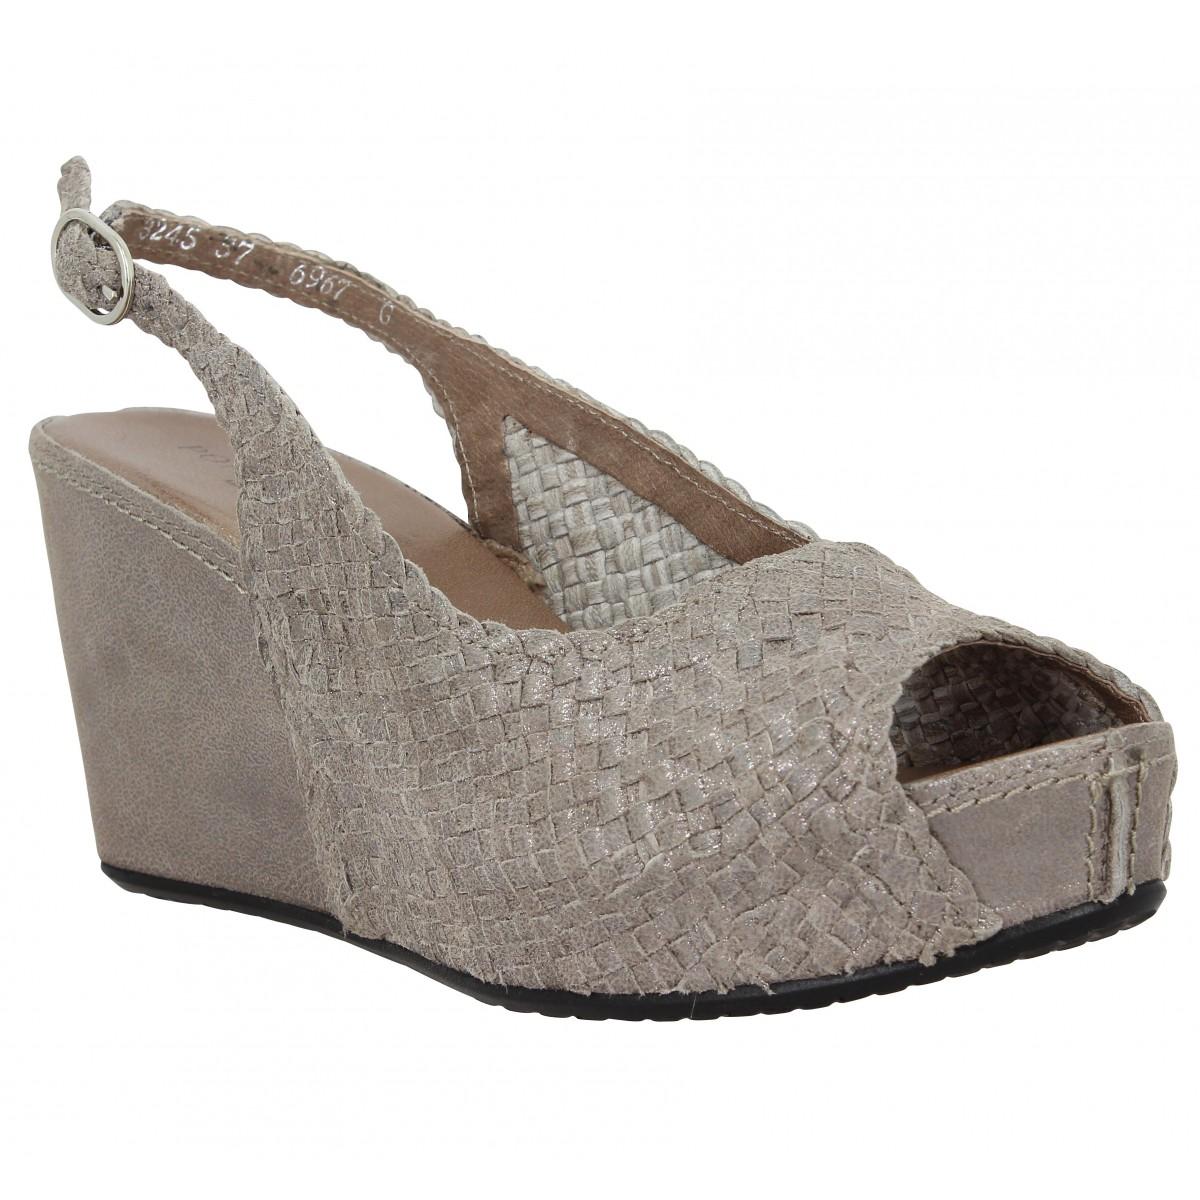 Sandales talons PONS QUINTANA 3245 cuir tresse Femme Taupe